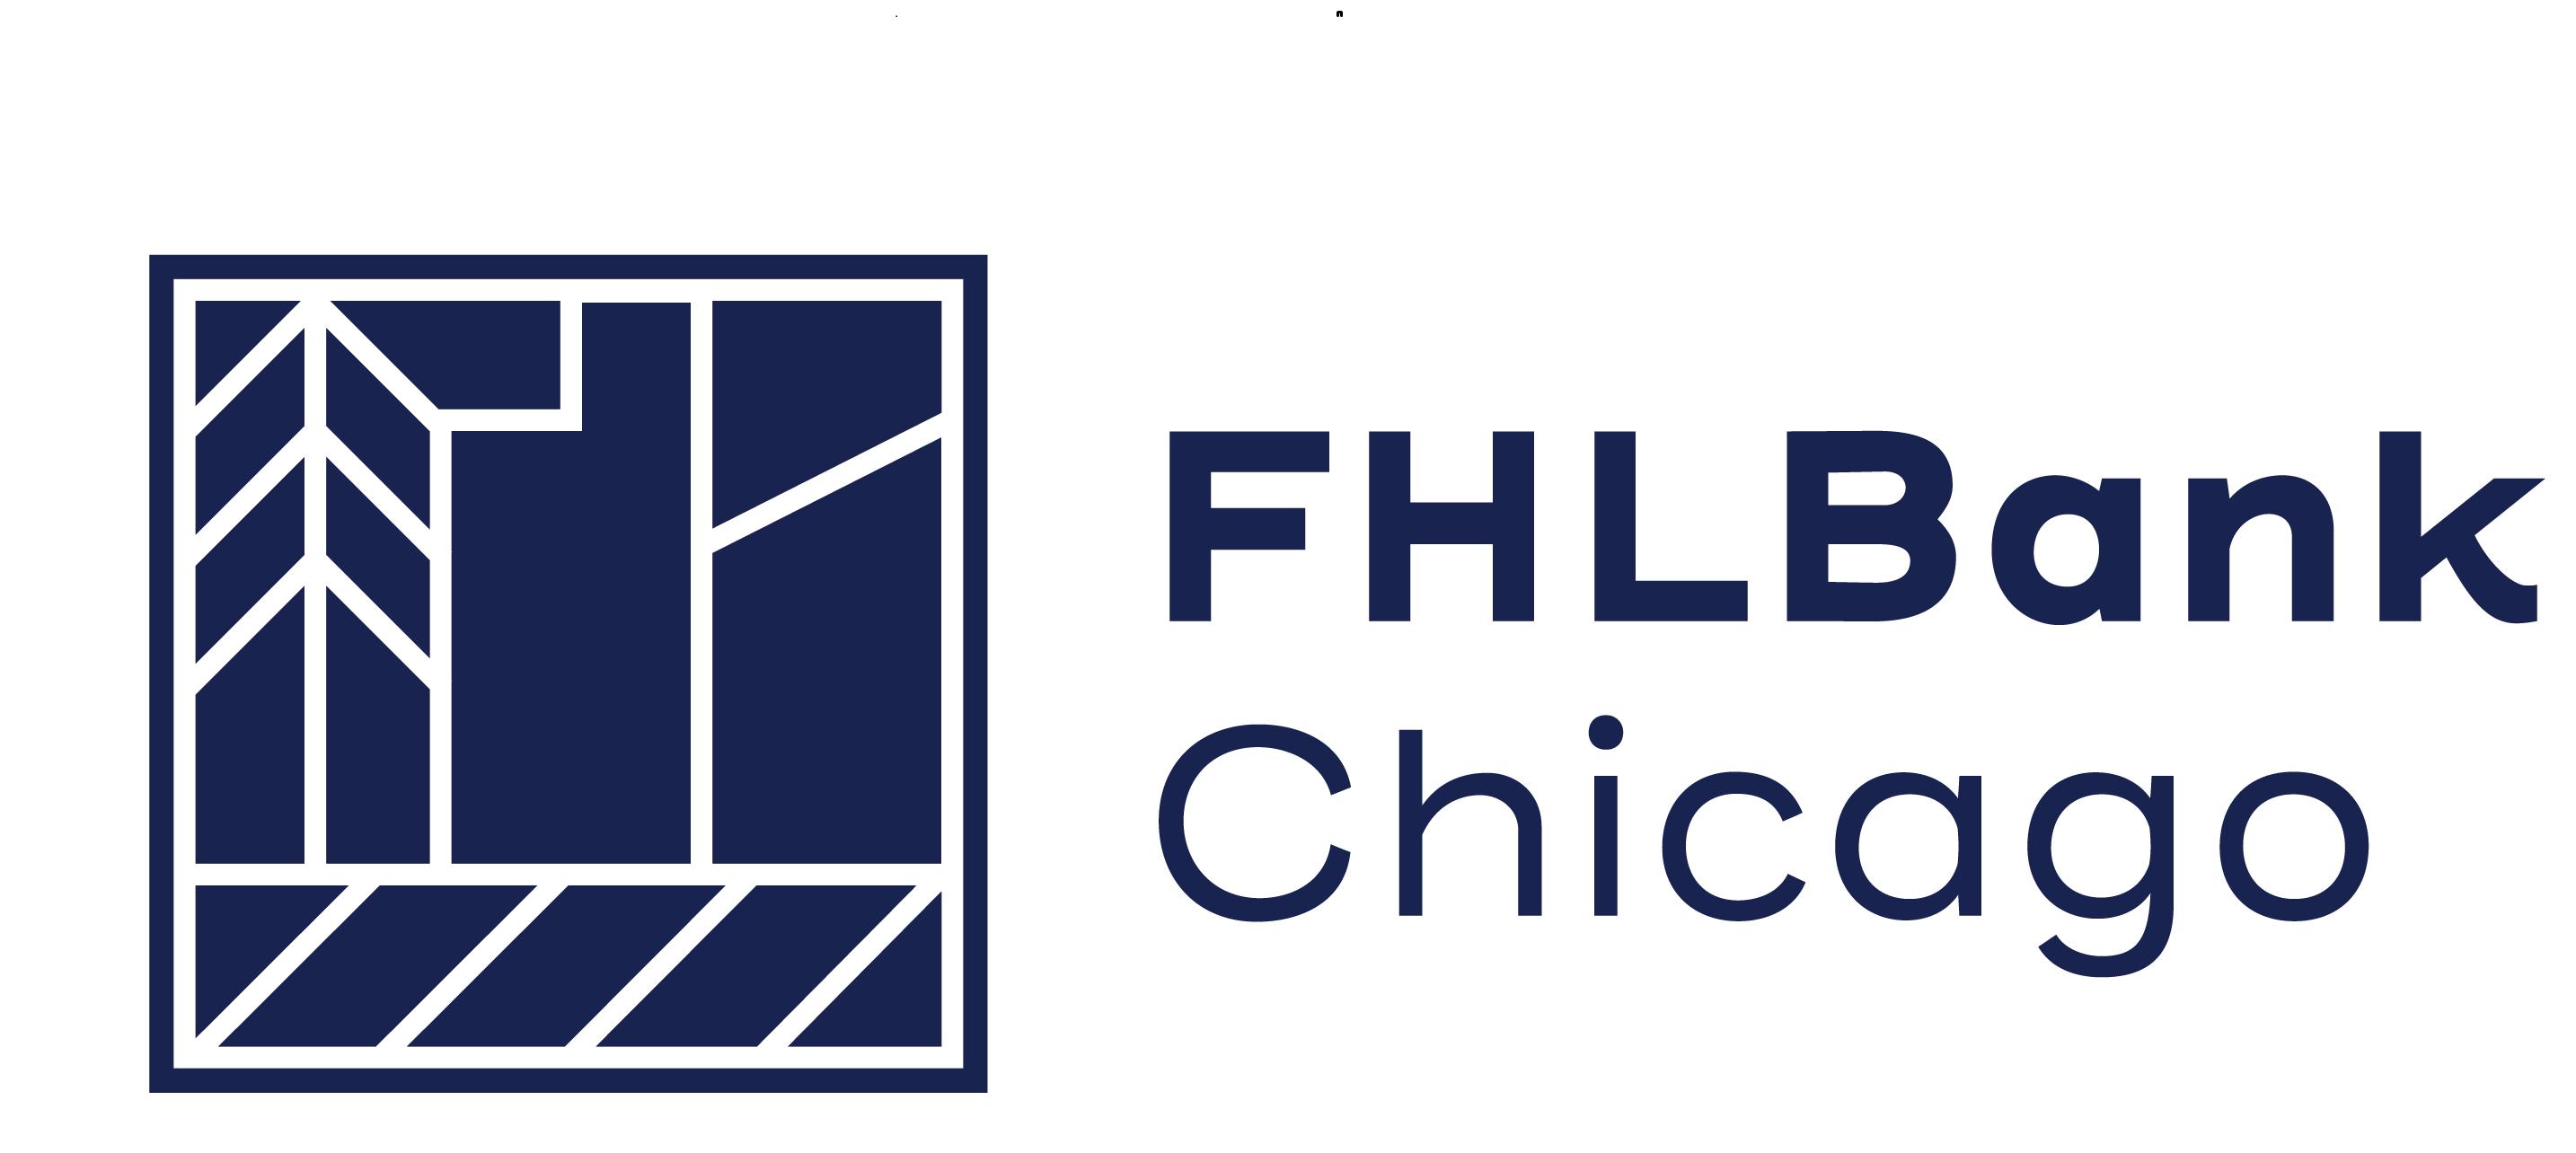 Federal Home Loan Bank Chicago (FHLBank Chicago) logo